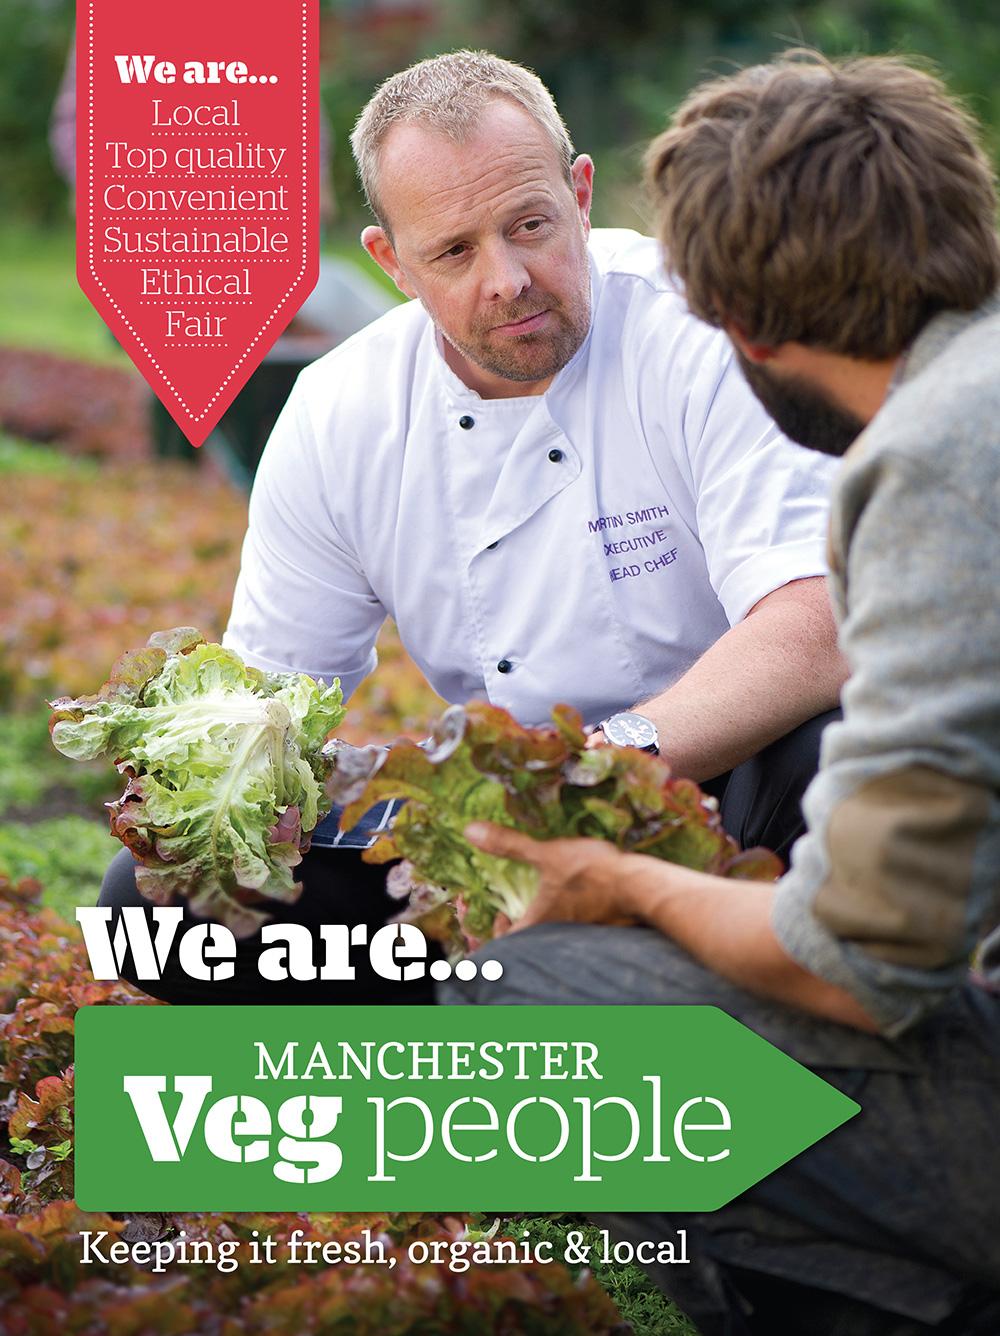 veg people brochure cover